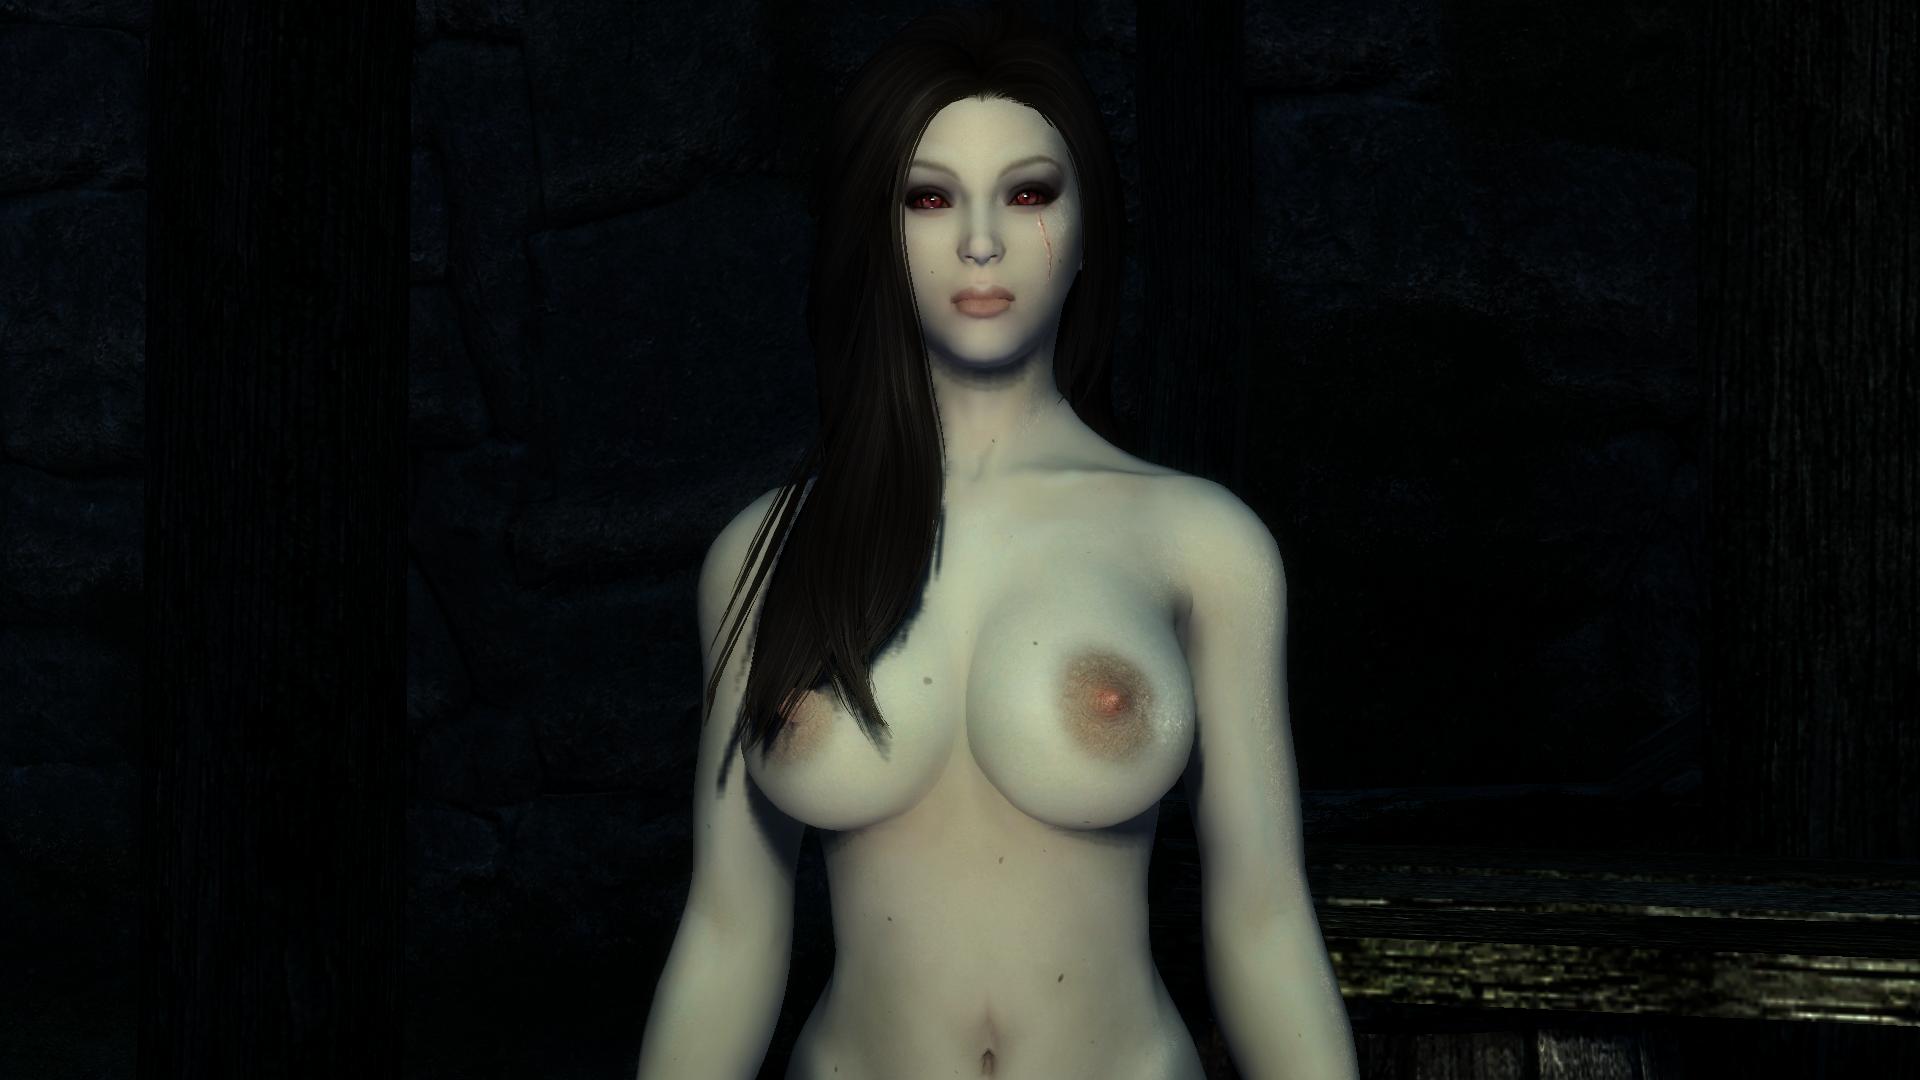 skyrim_sse_yg_dark_elf_dusk_2_by_silvist